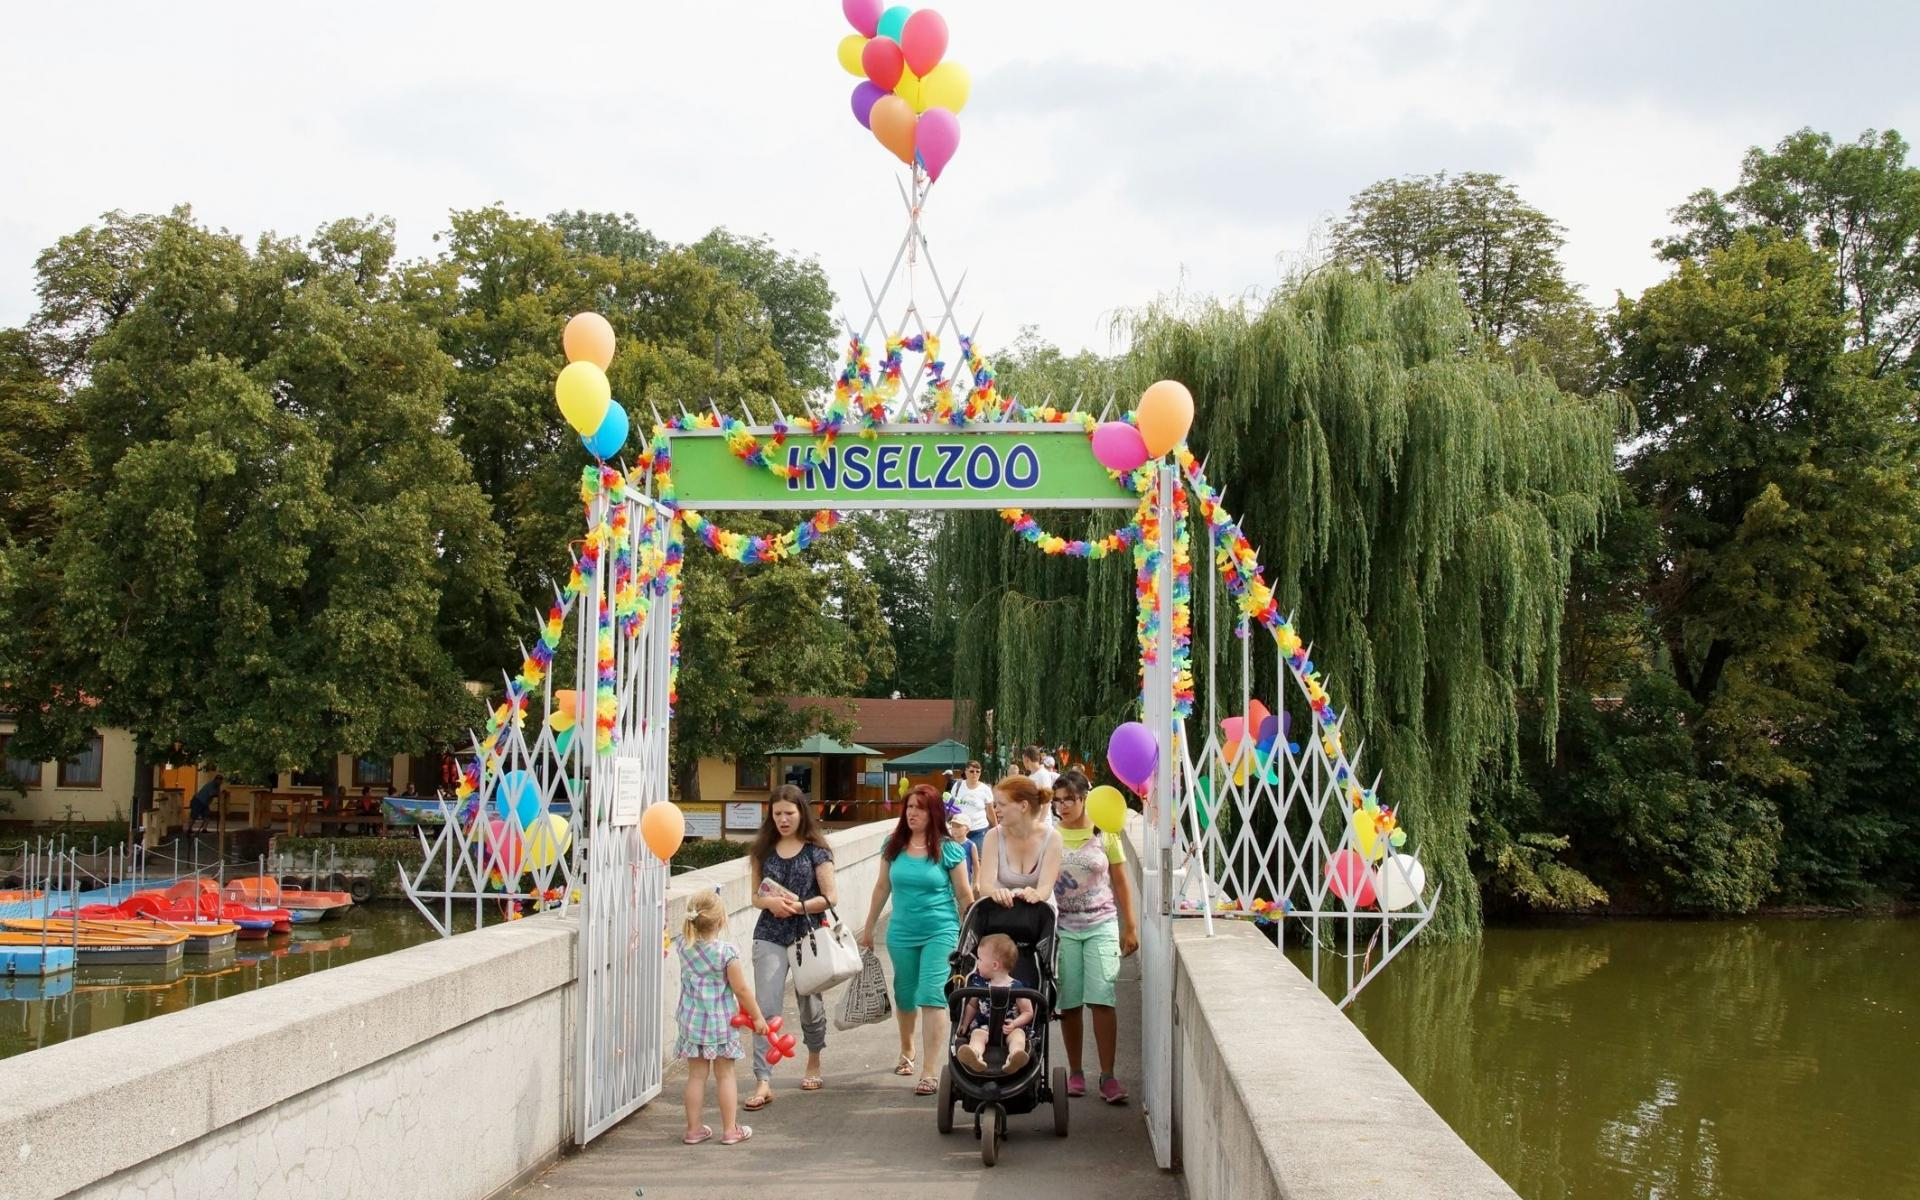 Inselzoofest (Bild 1)